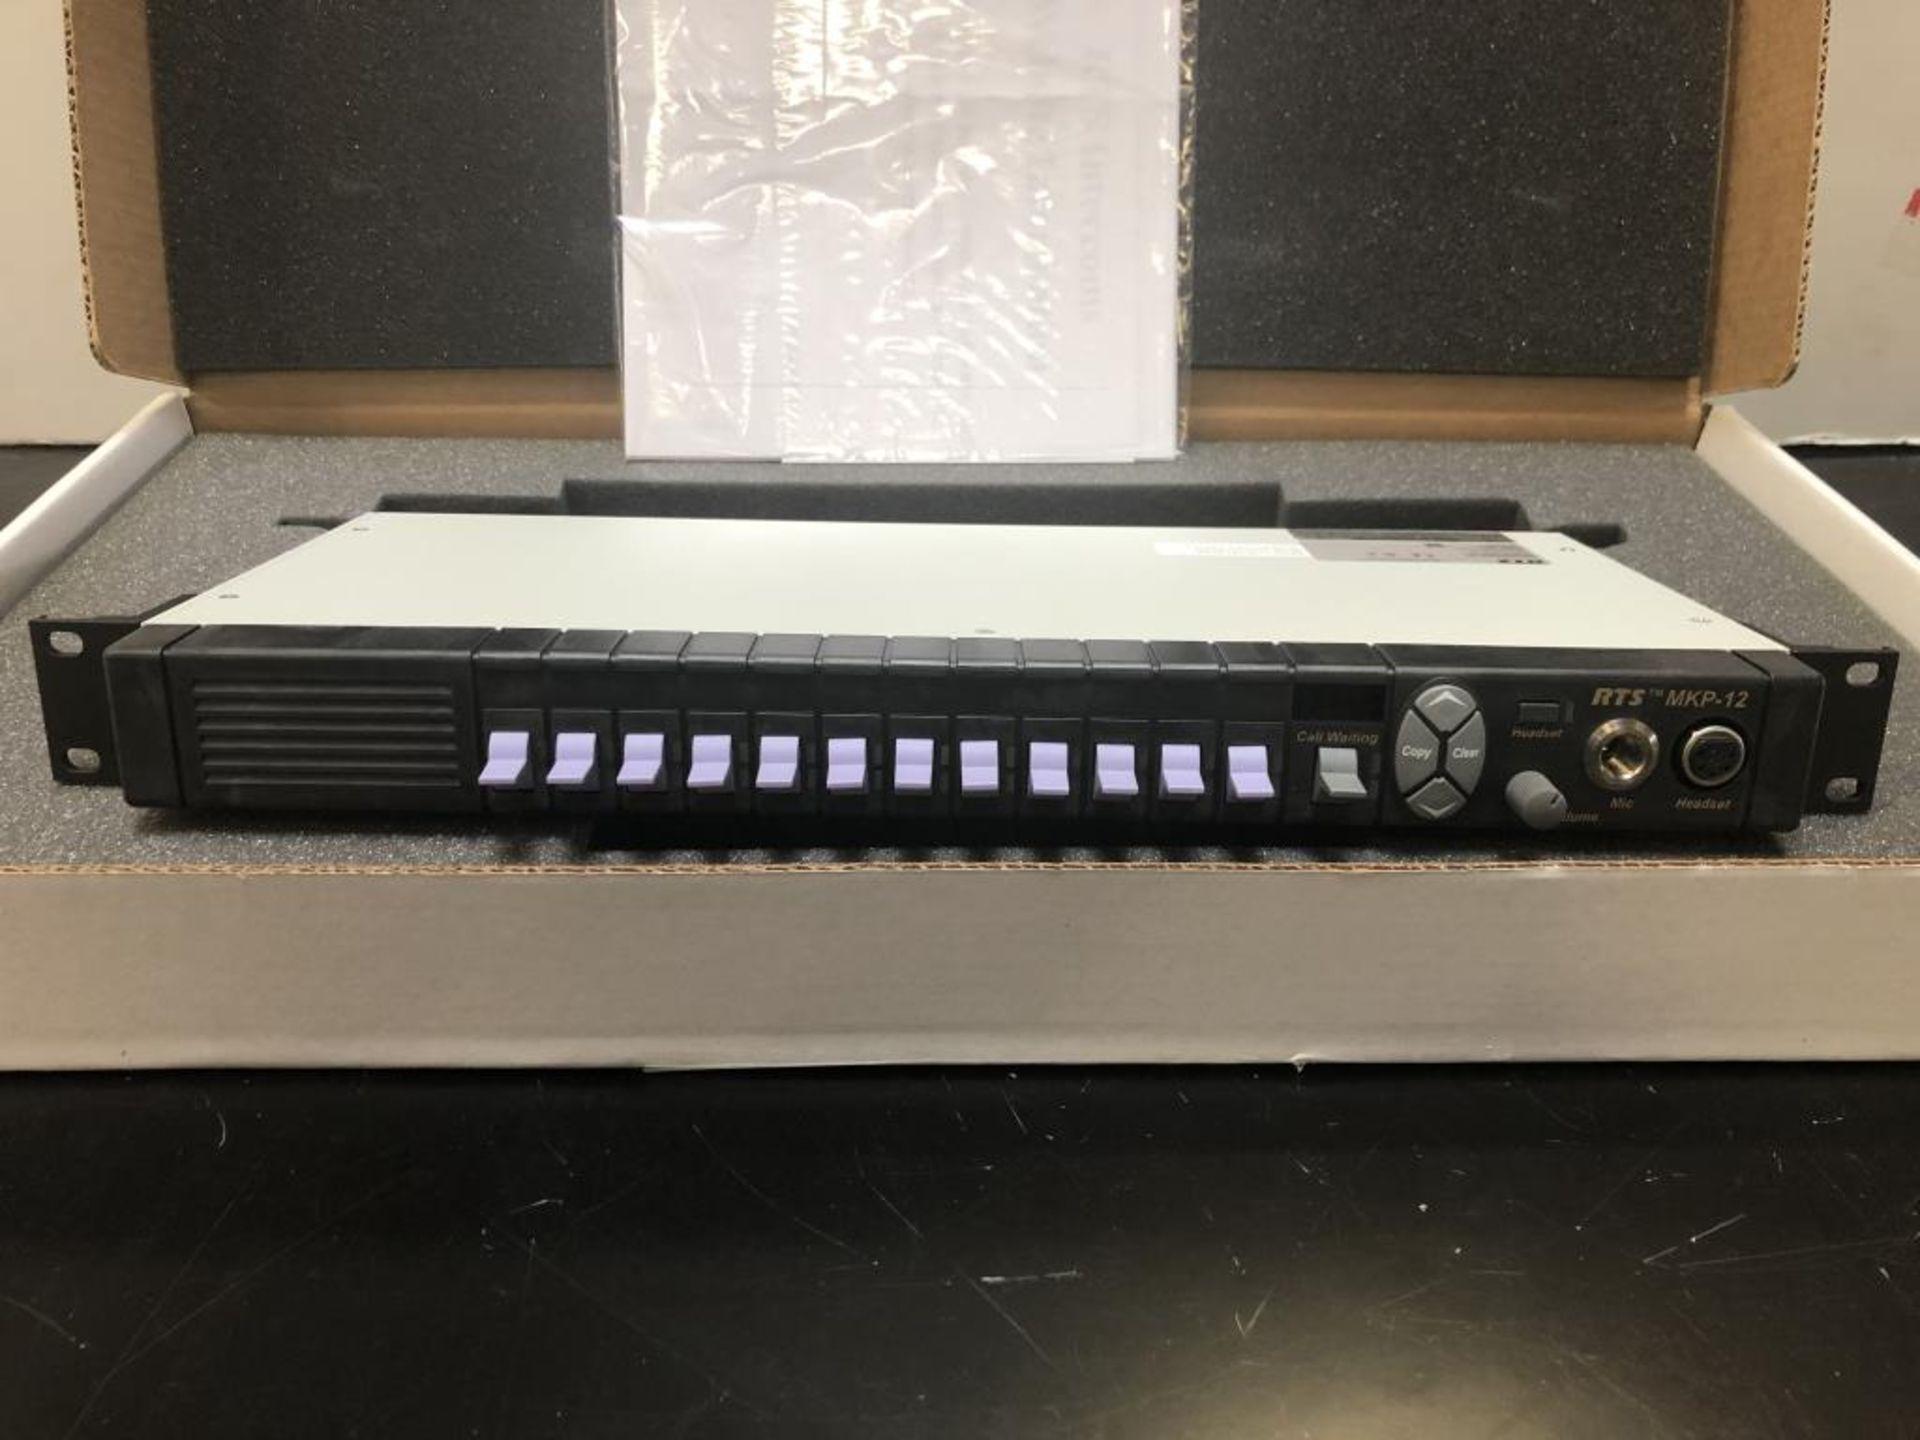 Intercom Keypanel - Image 2 of 8